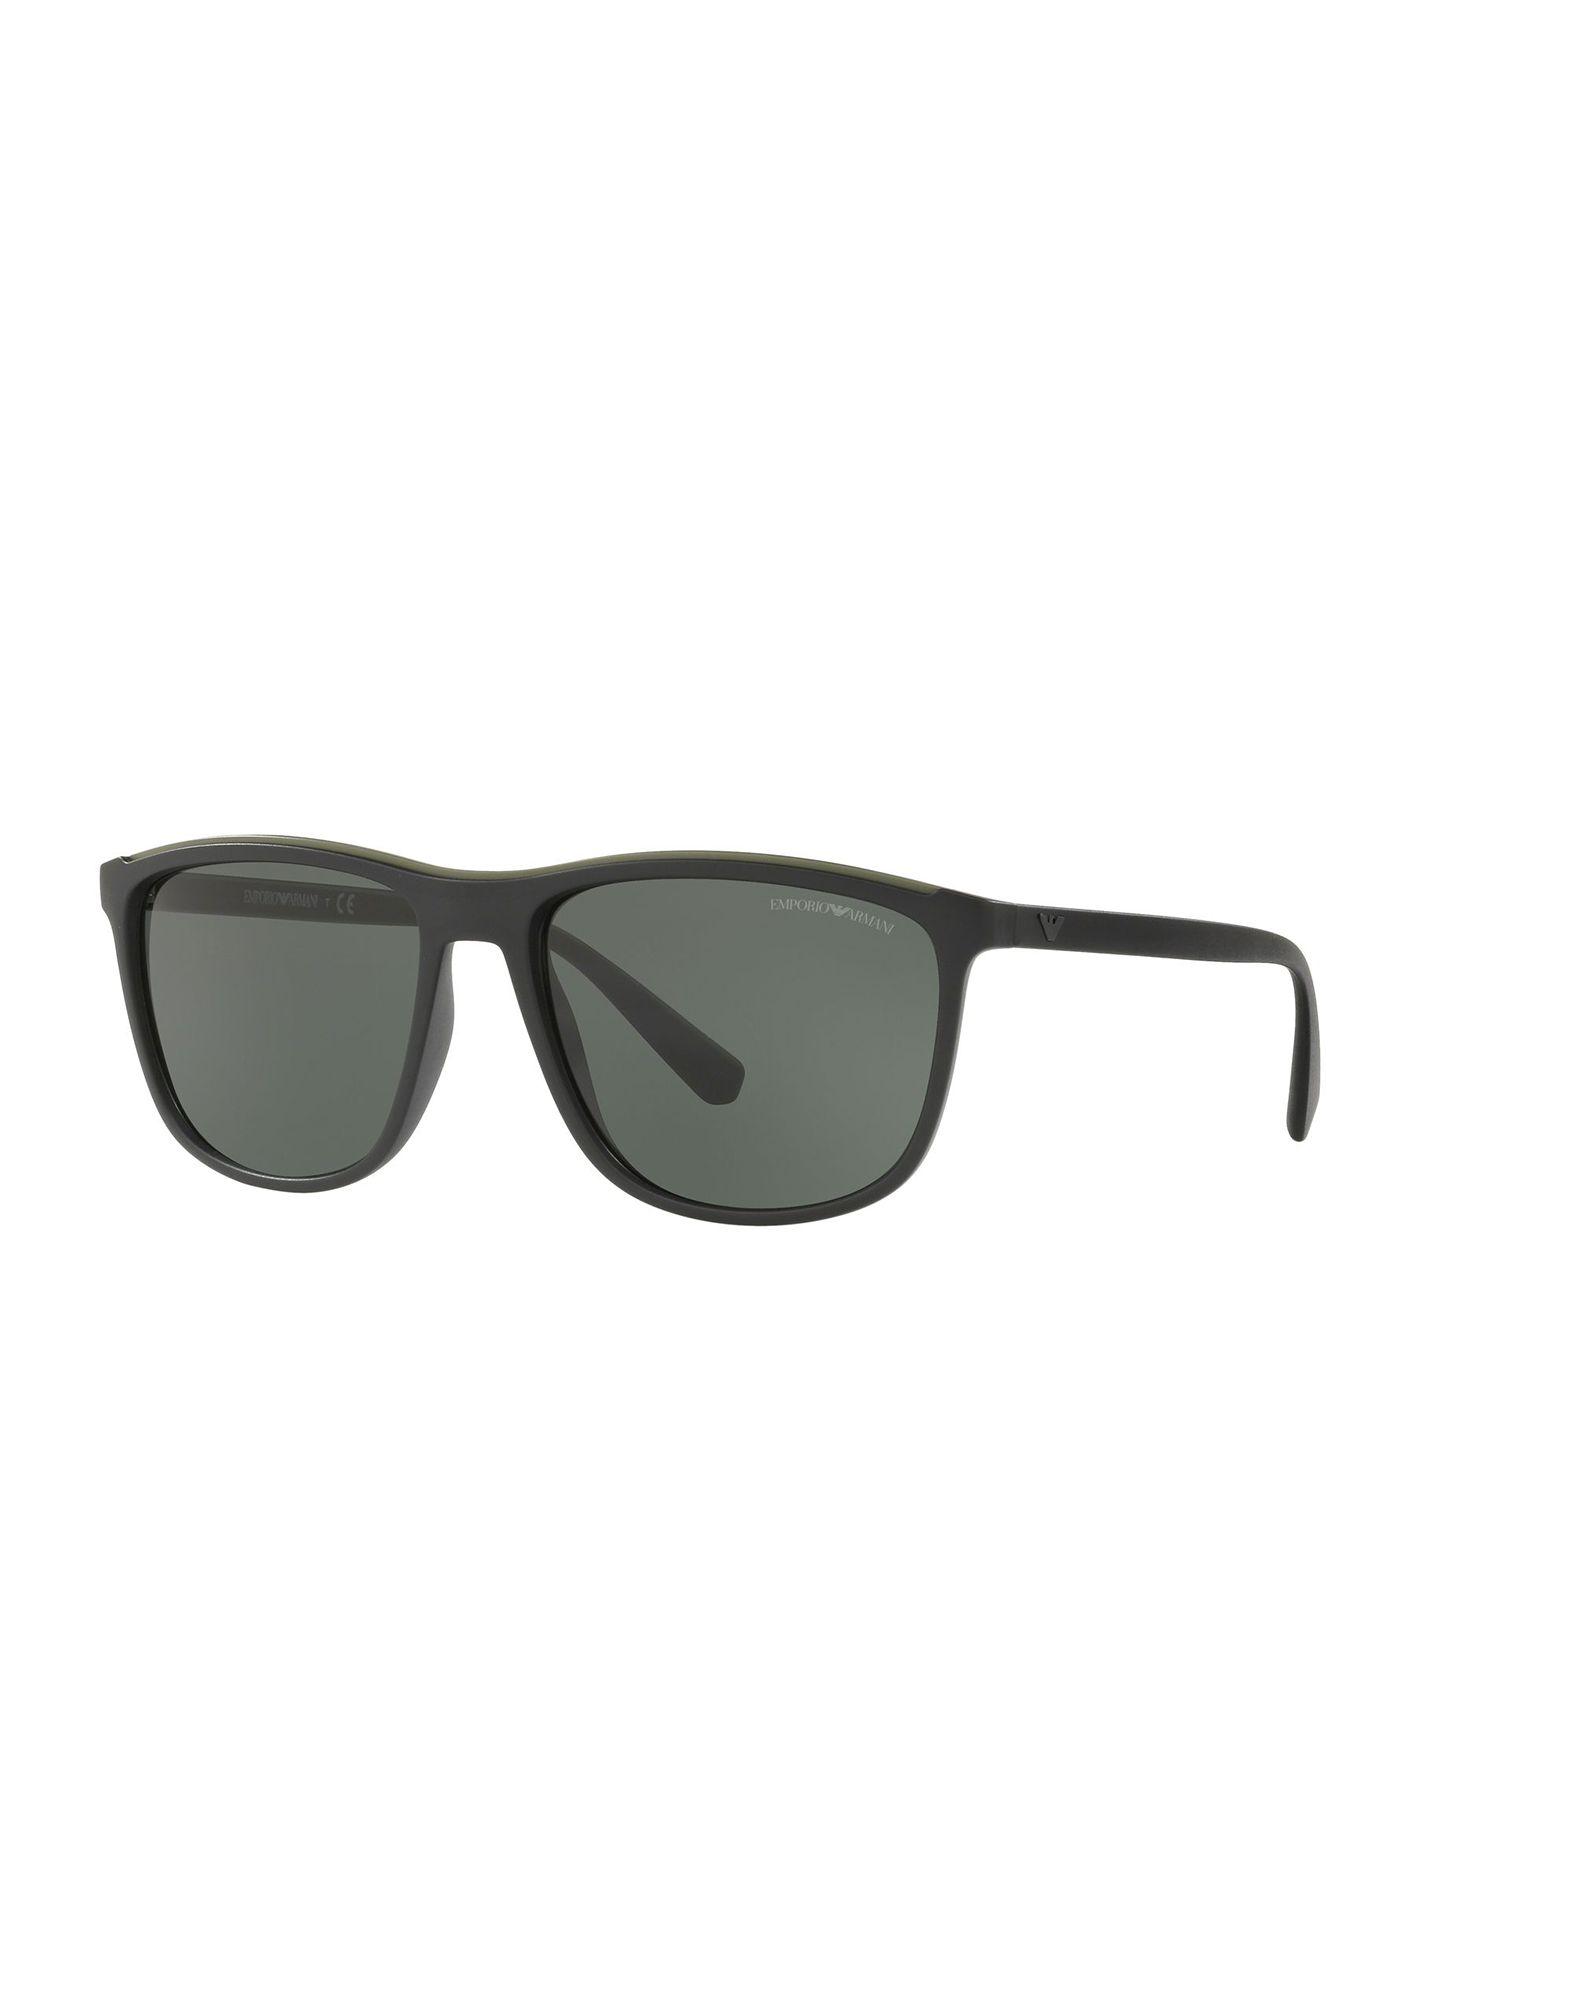 EMPORIO ARMANI Солнечные очки emporio armani солнечные очки